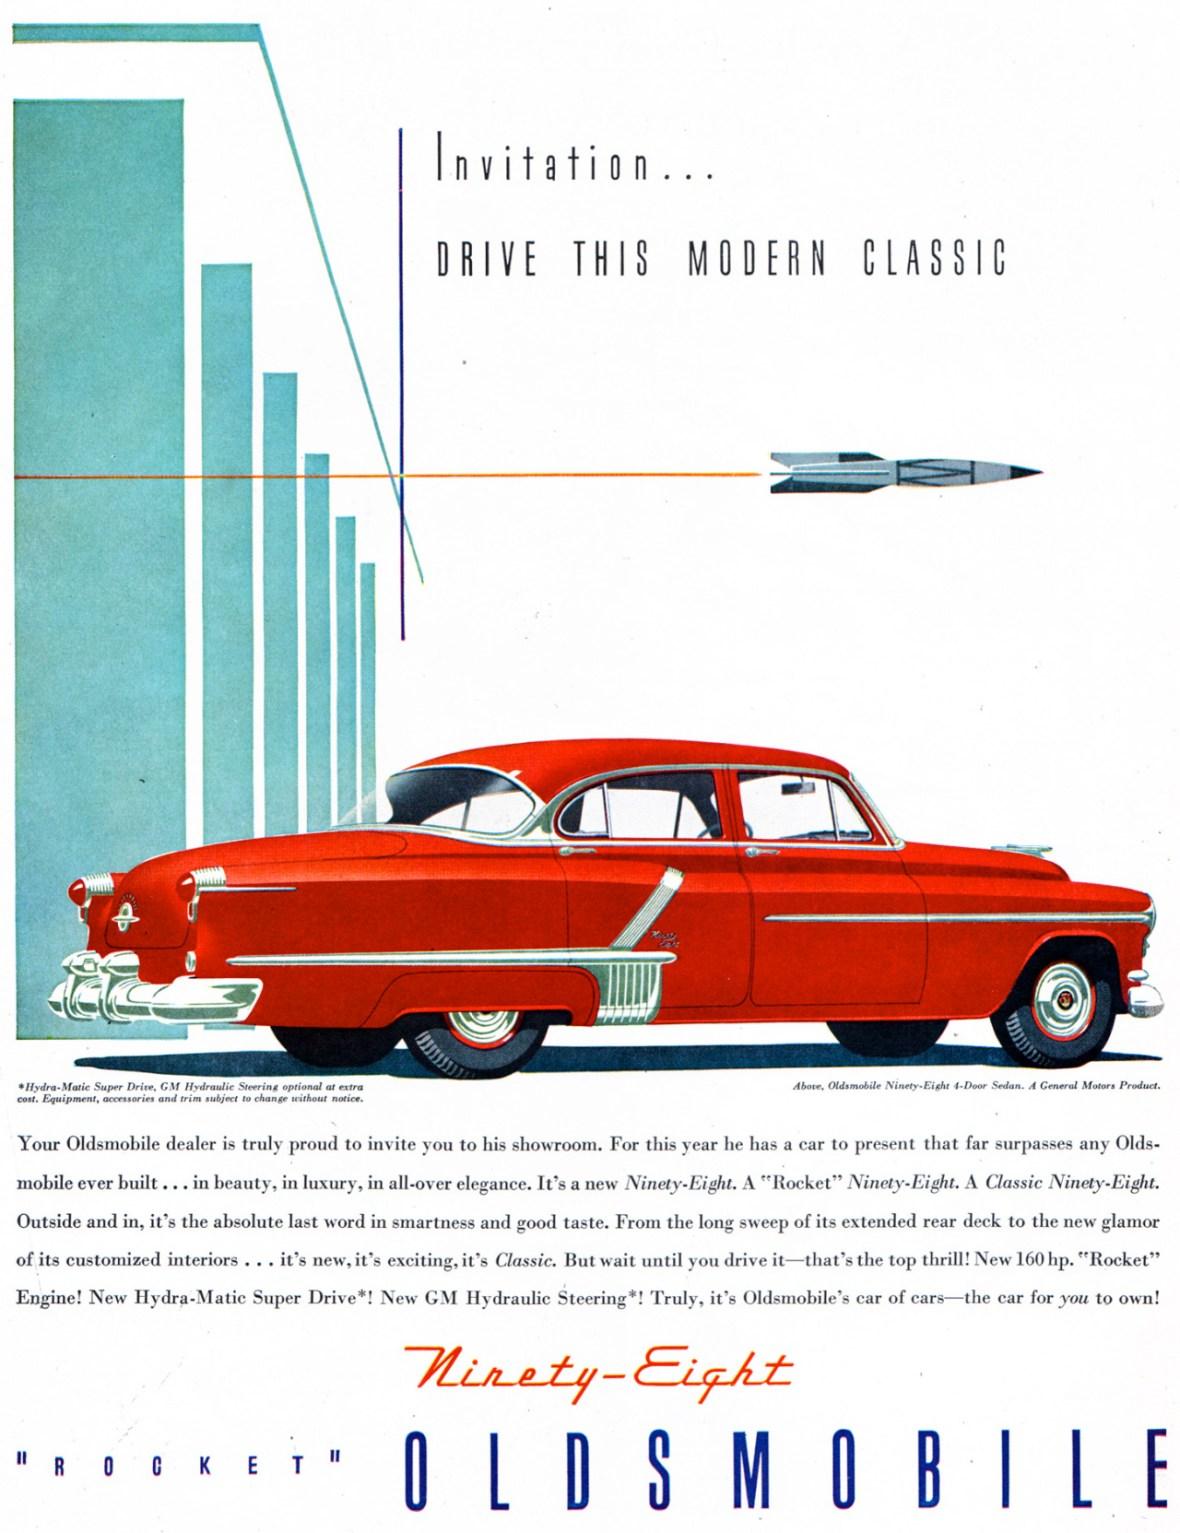 1952 Oldsmobile Ninety-Eight 4-Door Sedan